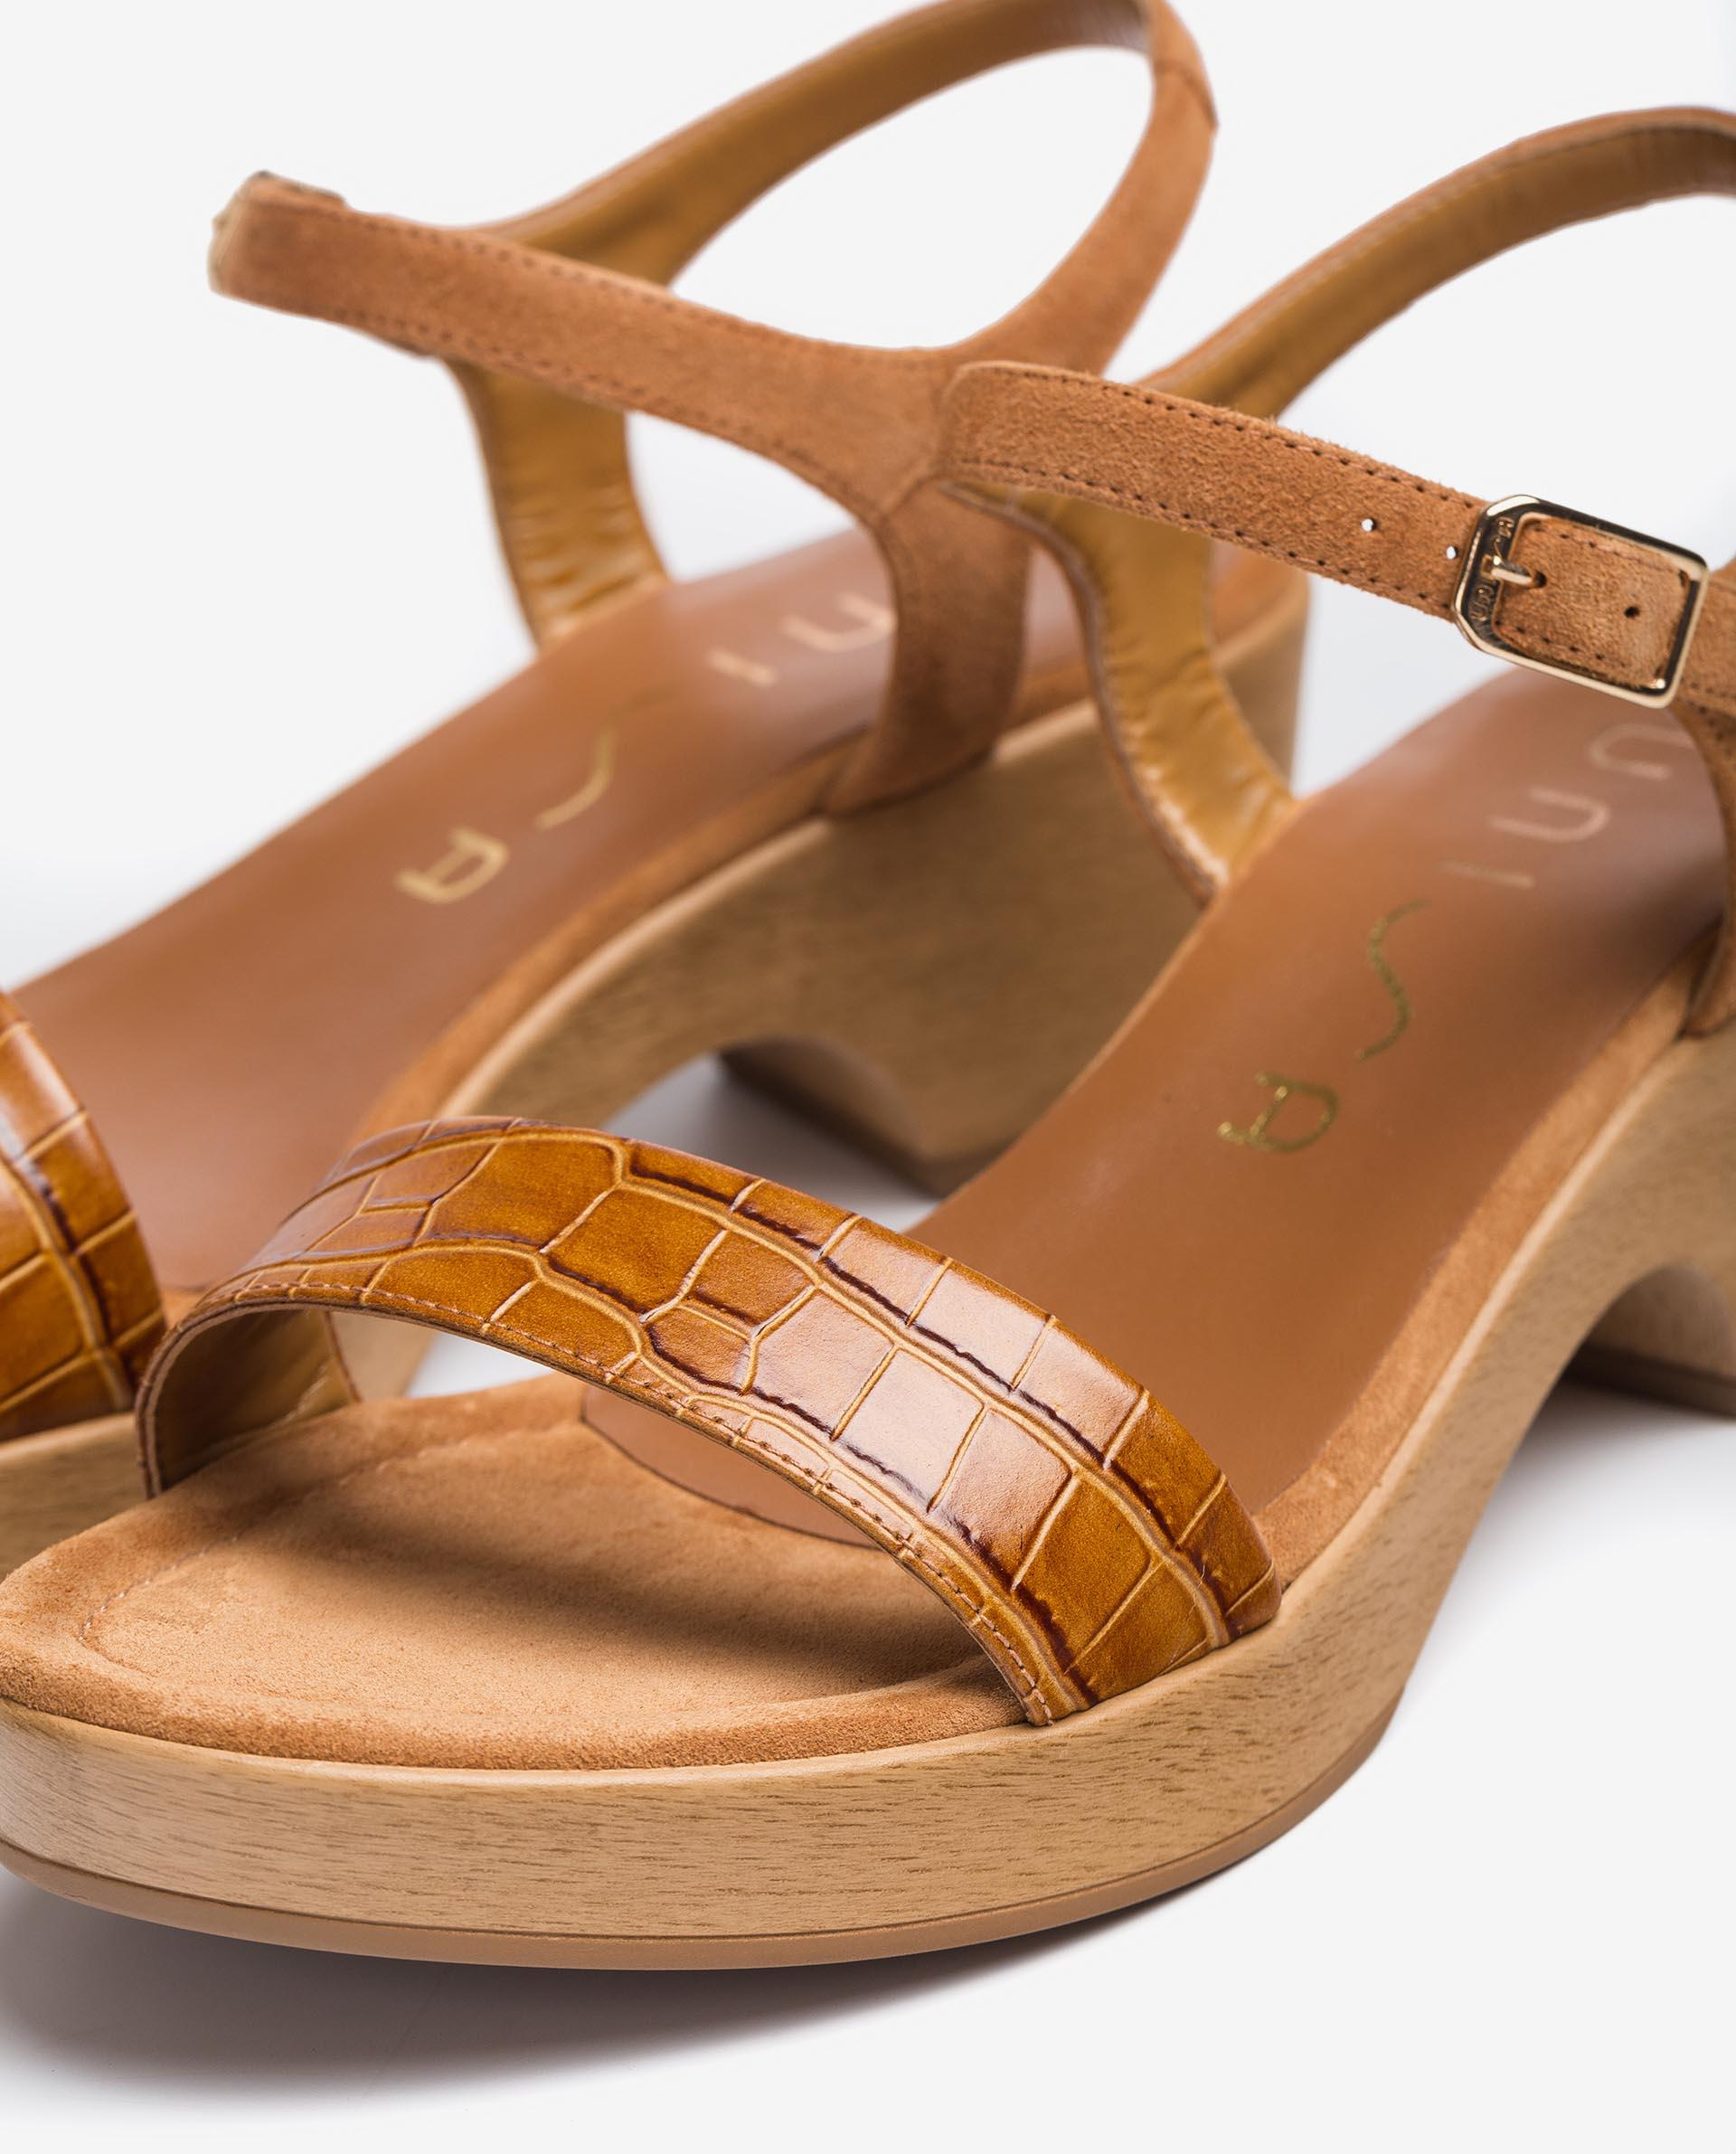 UNISA Sandalen in Kroko-Optik mit Blockabsatz IRITA_21_LAU_KS 5